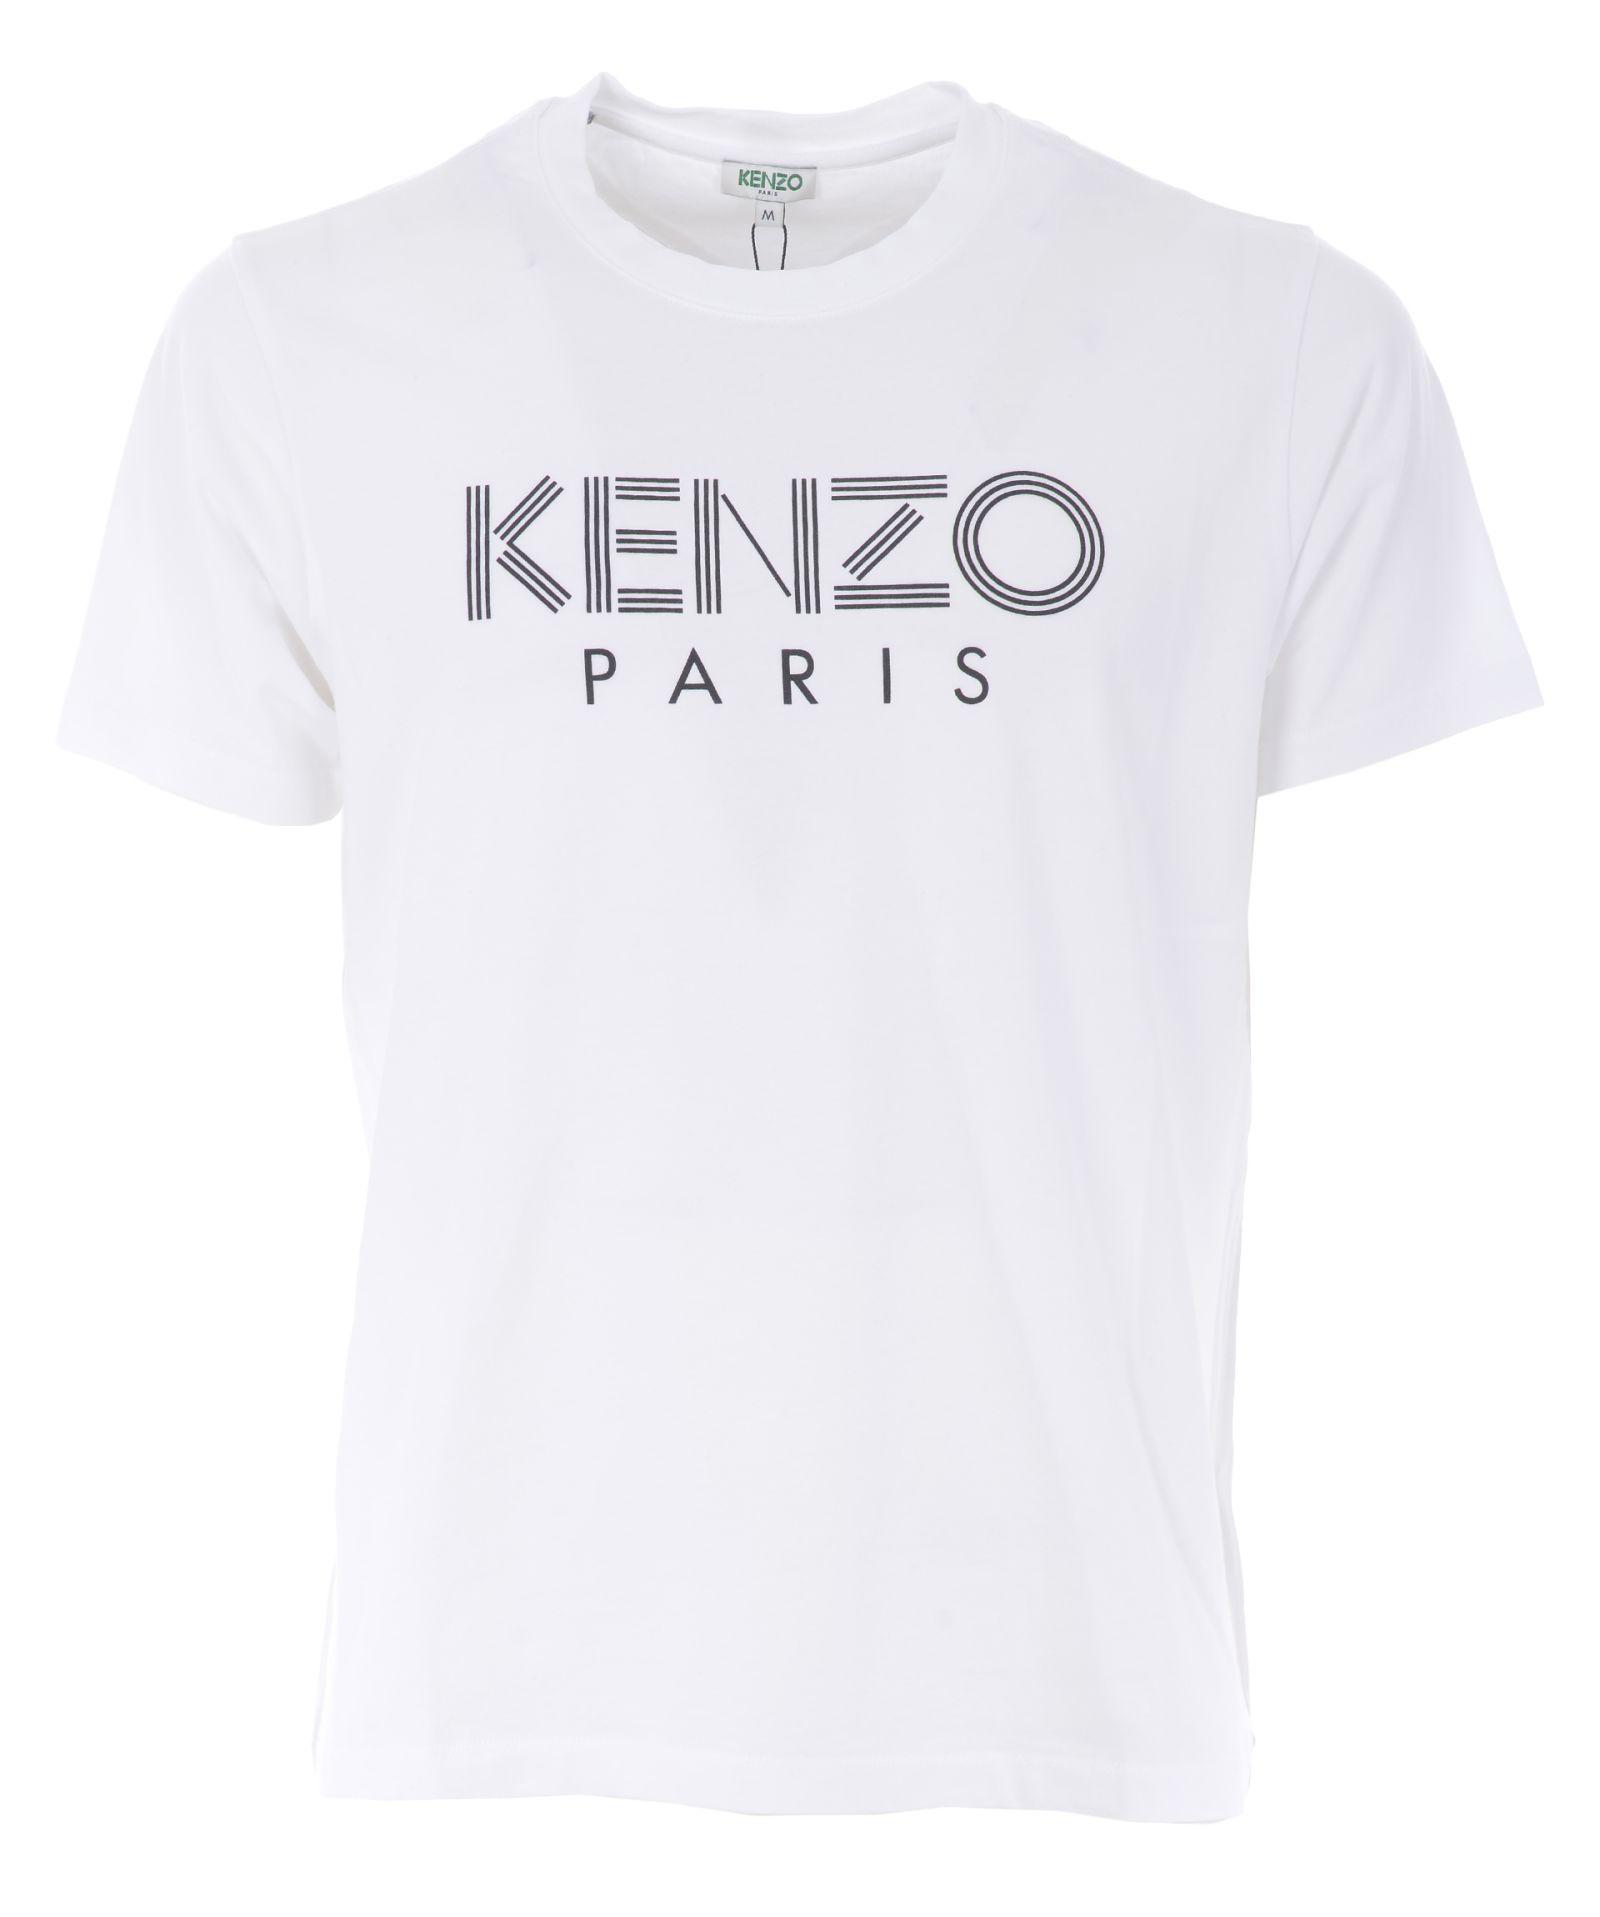 56a150559 Kenzo Kenzo Logo Print T-shirt - White - 10863450 | italist